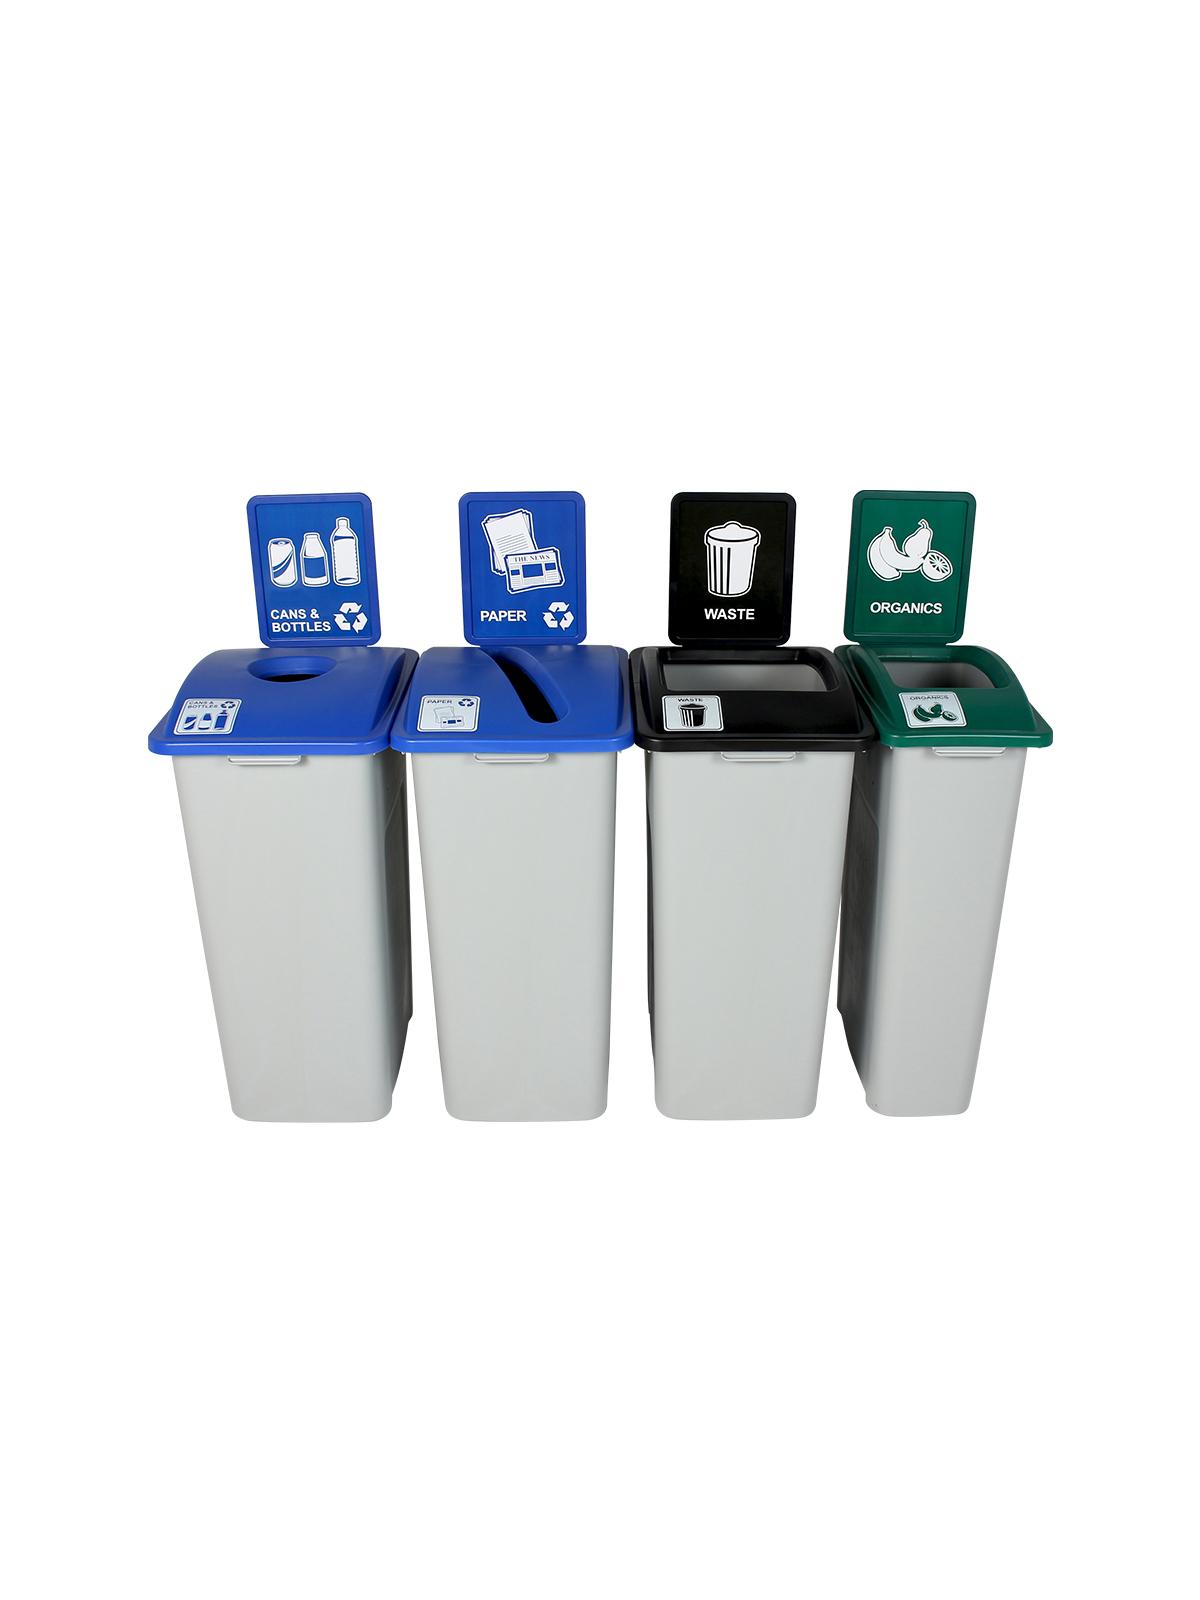 WASTE WATCHER XL - Quad - Cans & Bottles-Paper-Organics-Waste - Circle-Slot-Full - Grey-Blue-Blue-Green-Black